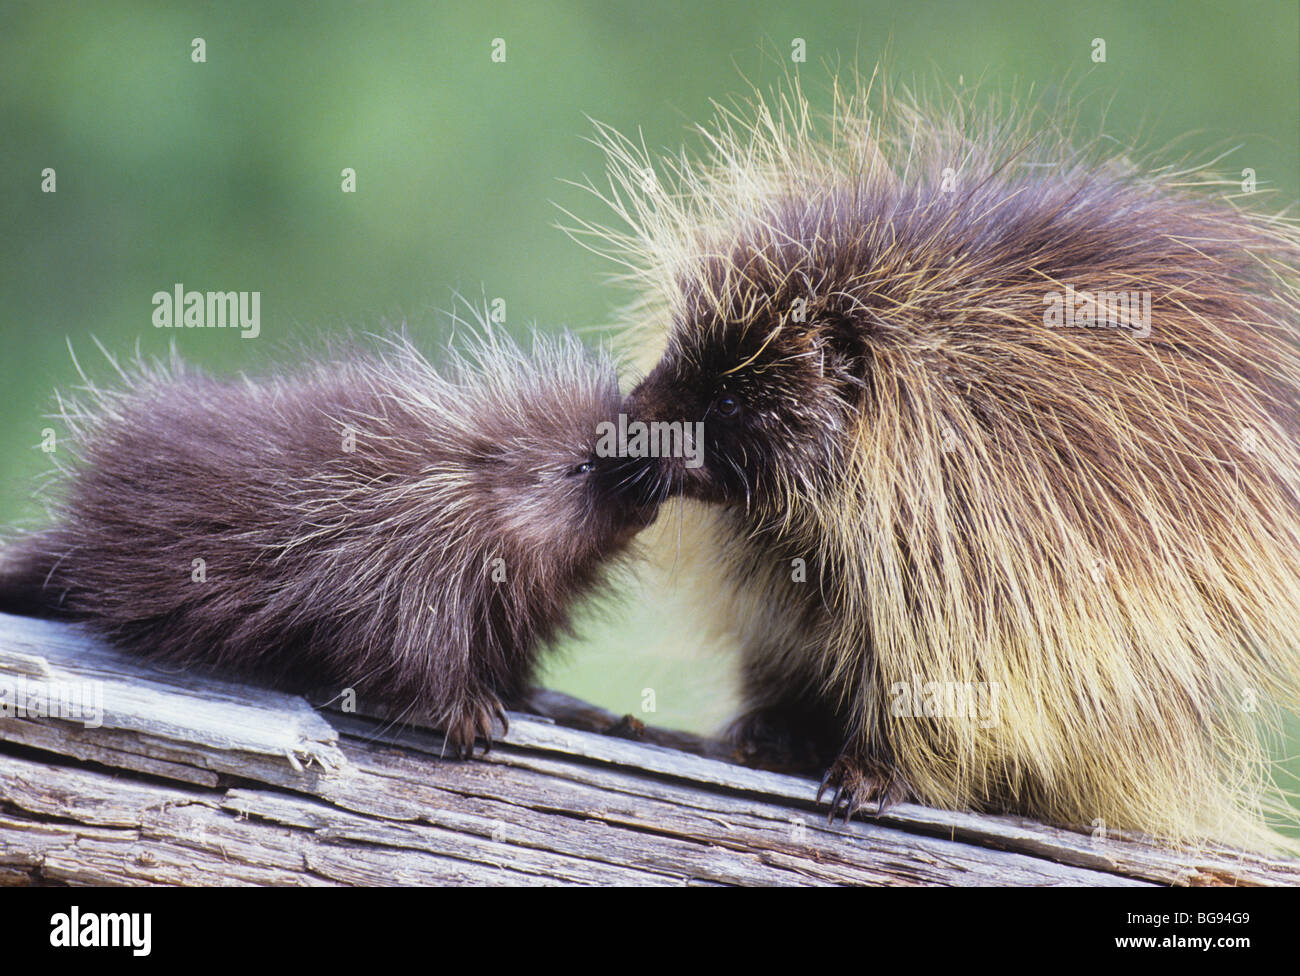 North American Porcupine (Erethizon dorsatum), mother kissing young, captive, USA Stock Photo